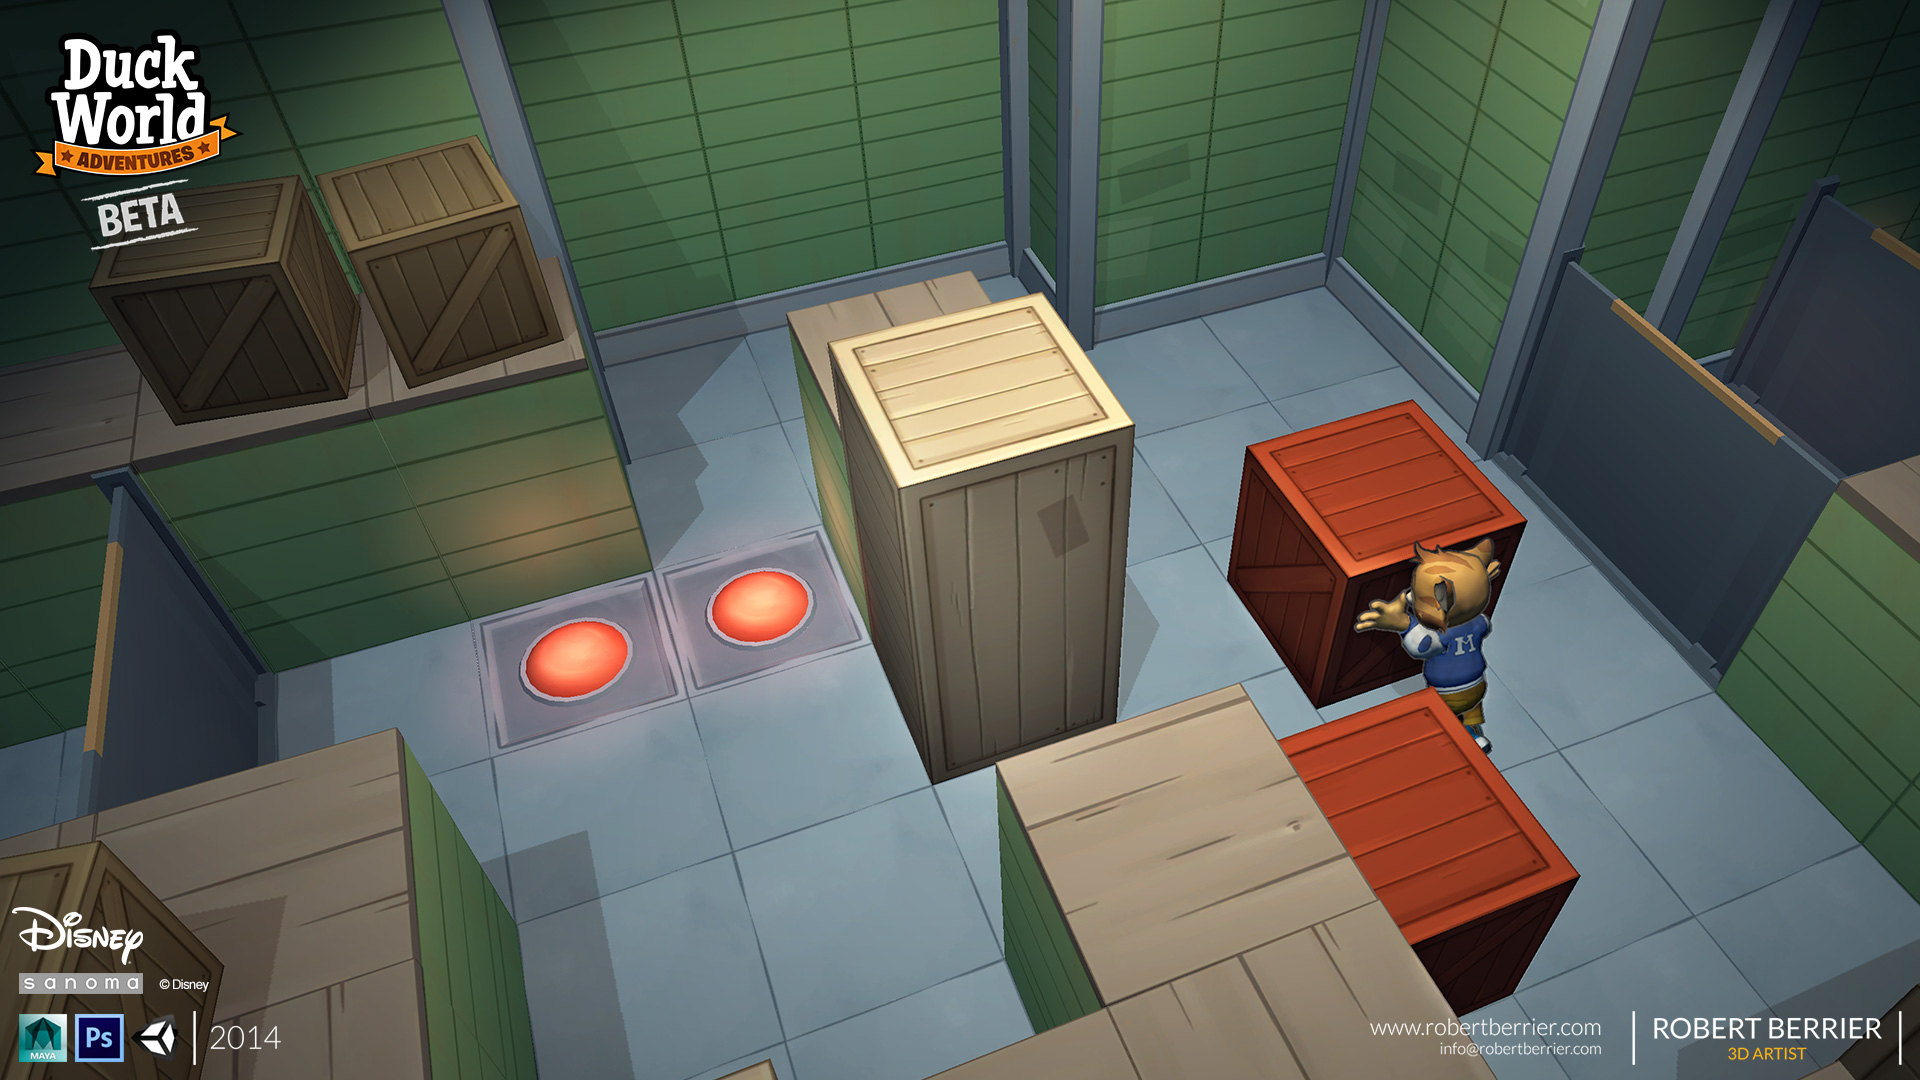 Robert Berrier - Disney - Duck World - Push The Crate